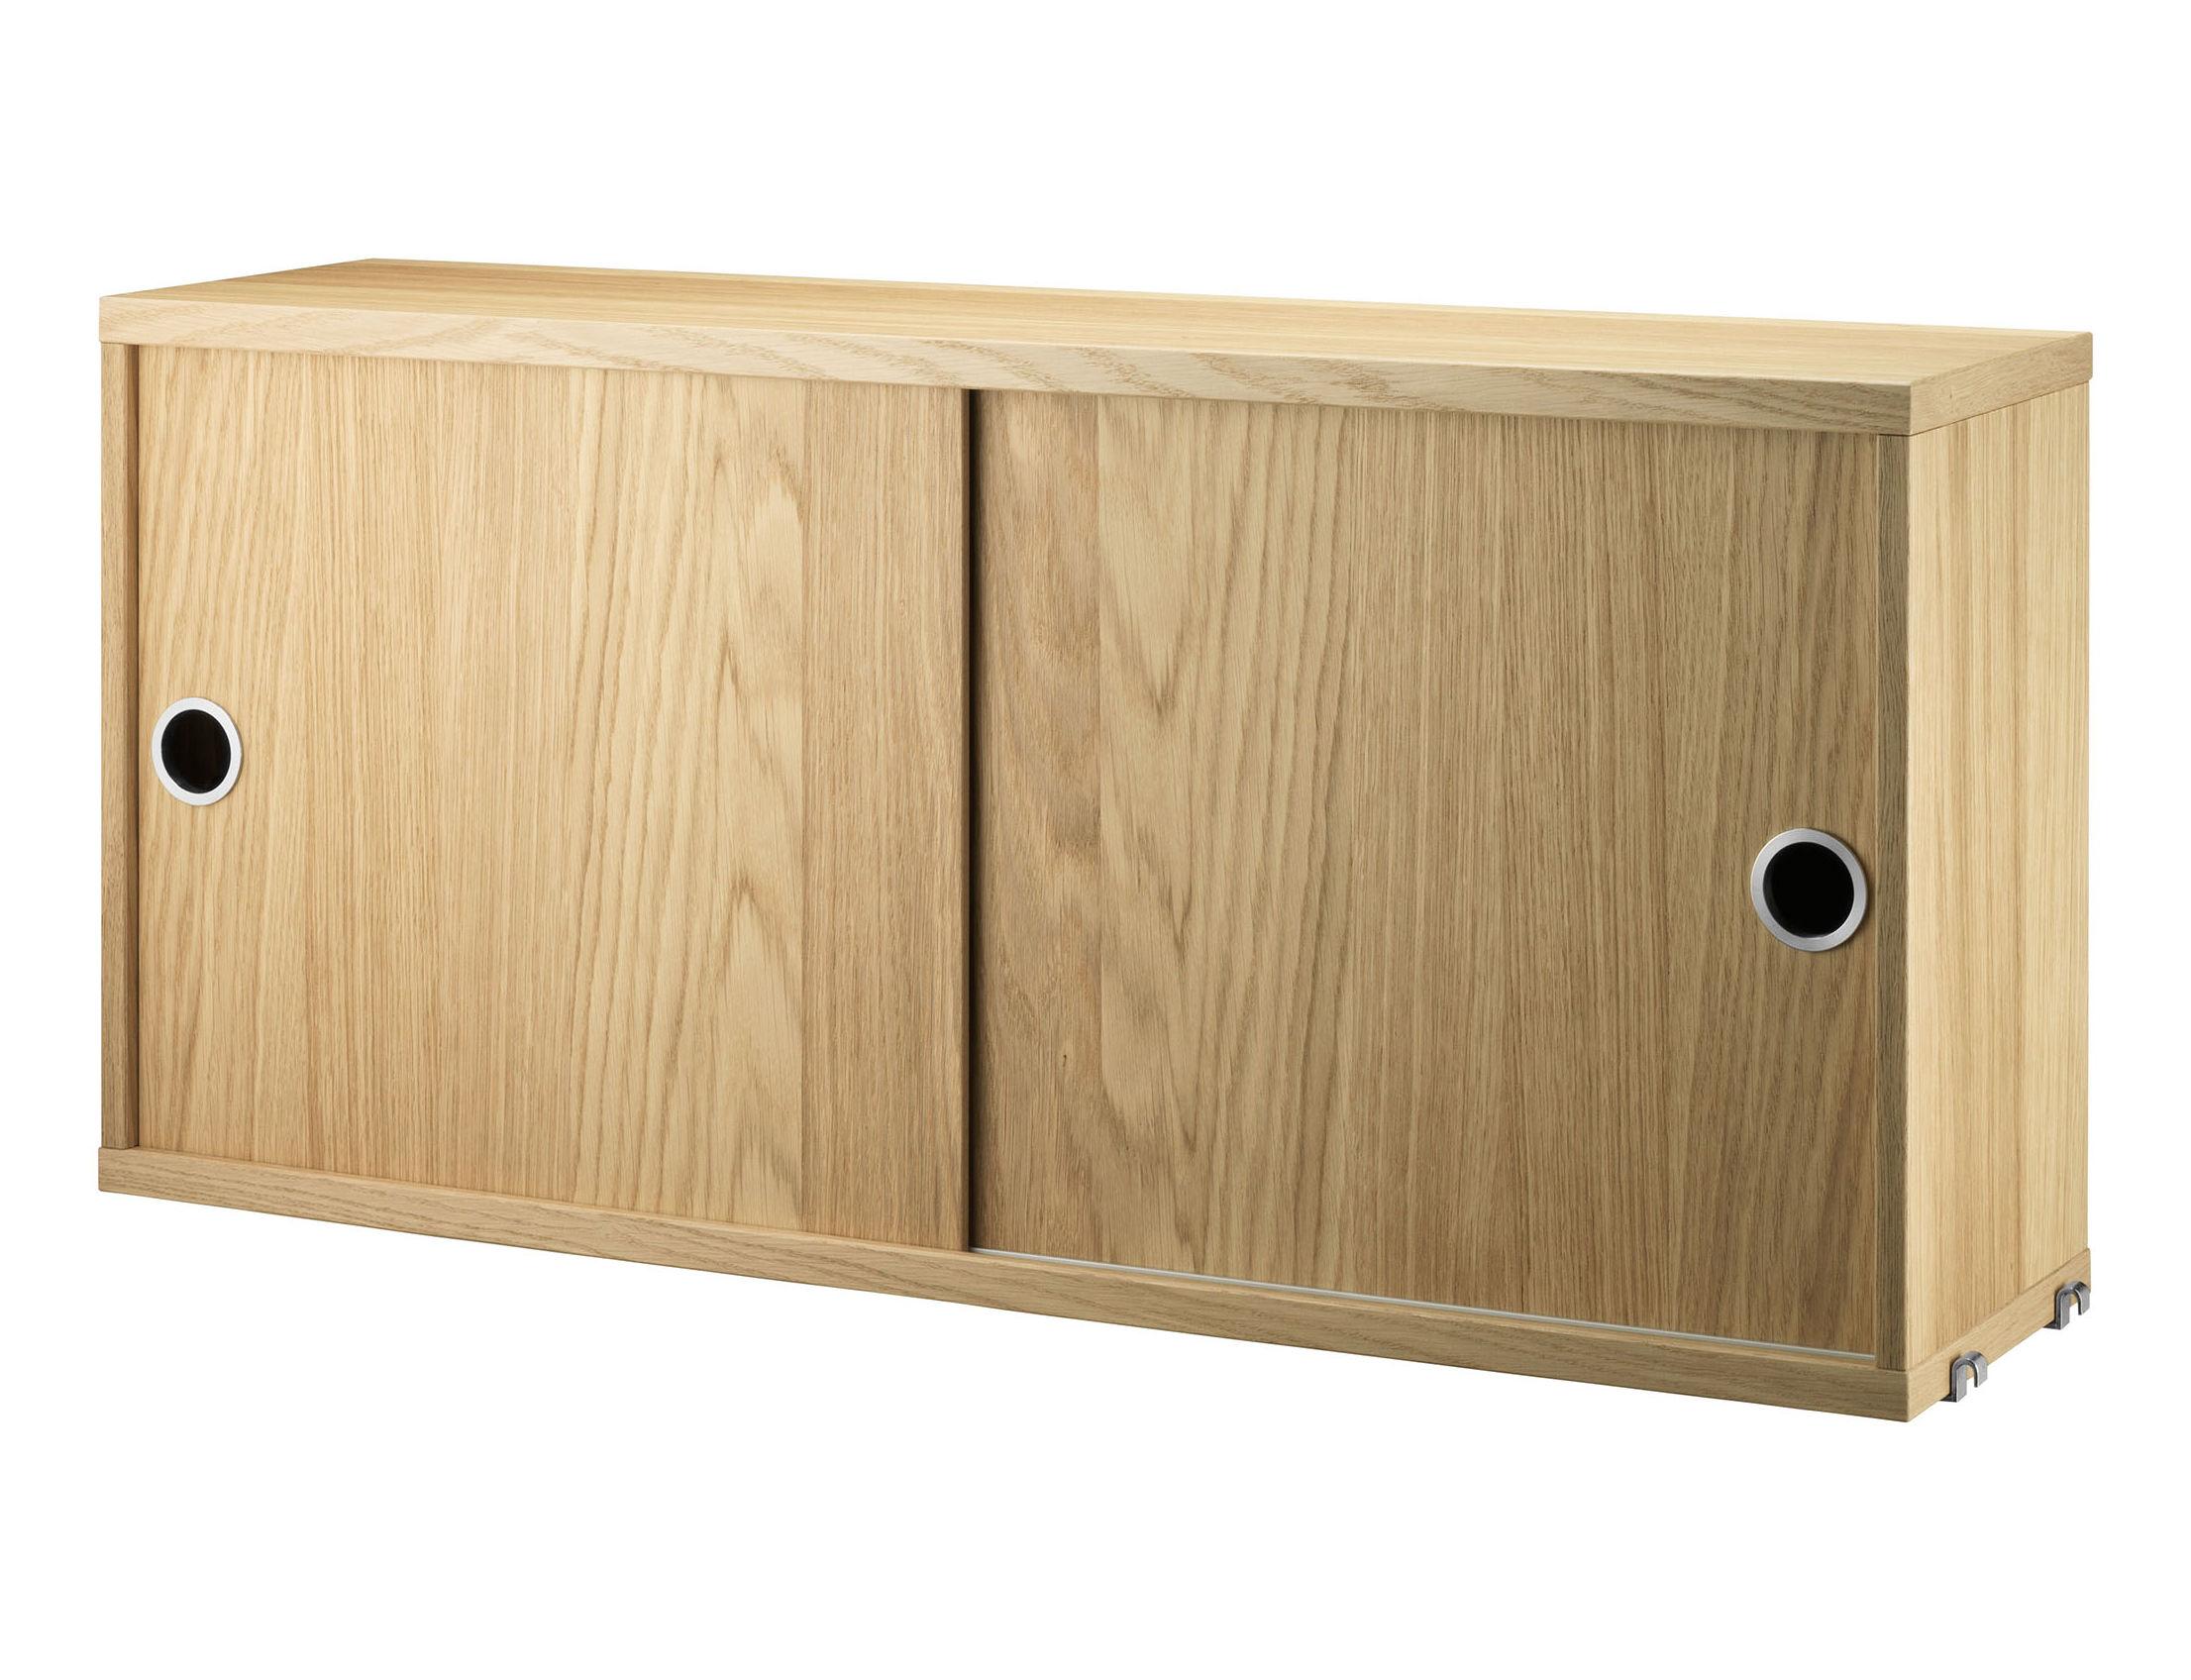 Furniture - Bookcases & Bookshelves - String System Crate - / 2 doors - L 78 x D 20 cm by String Furniture - Oak - Oak plywood